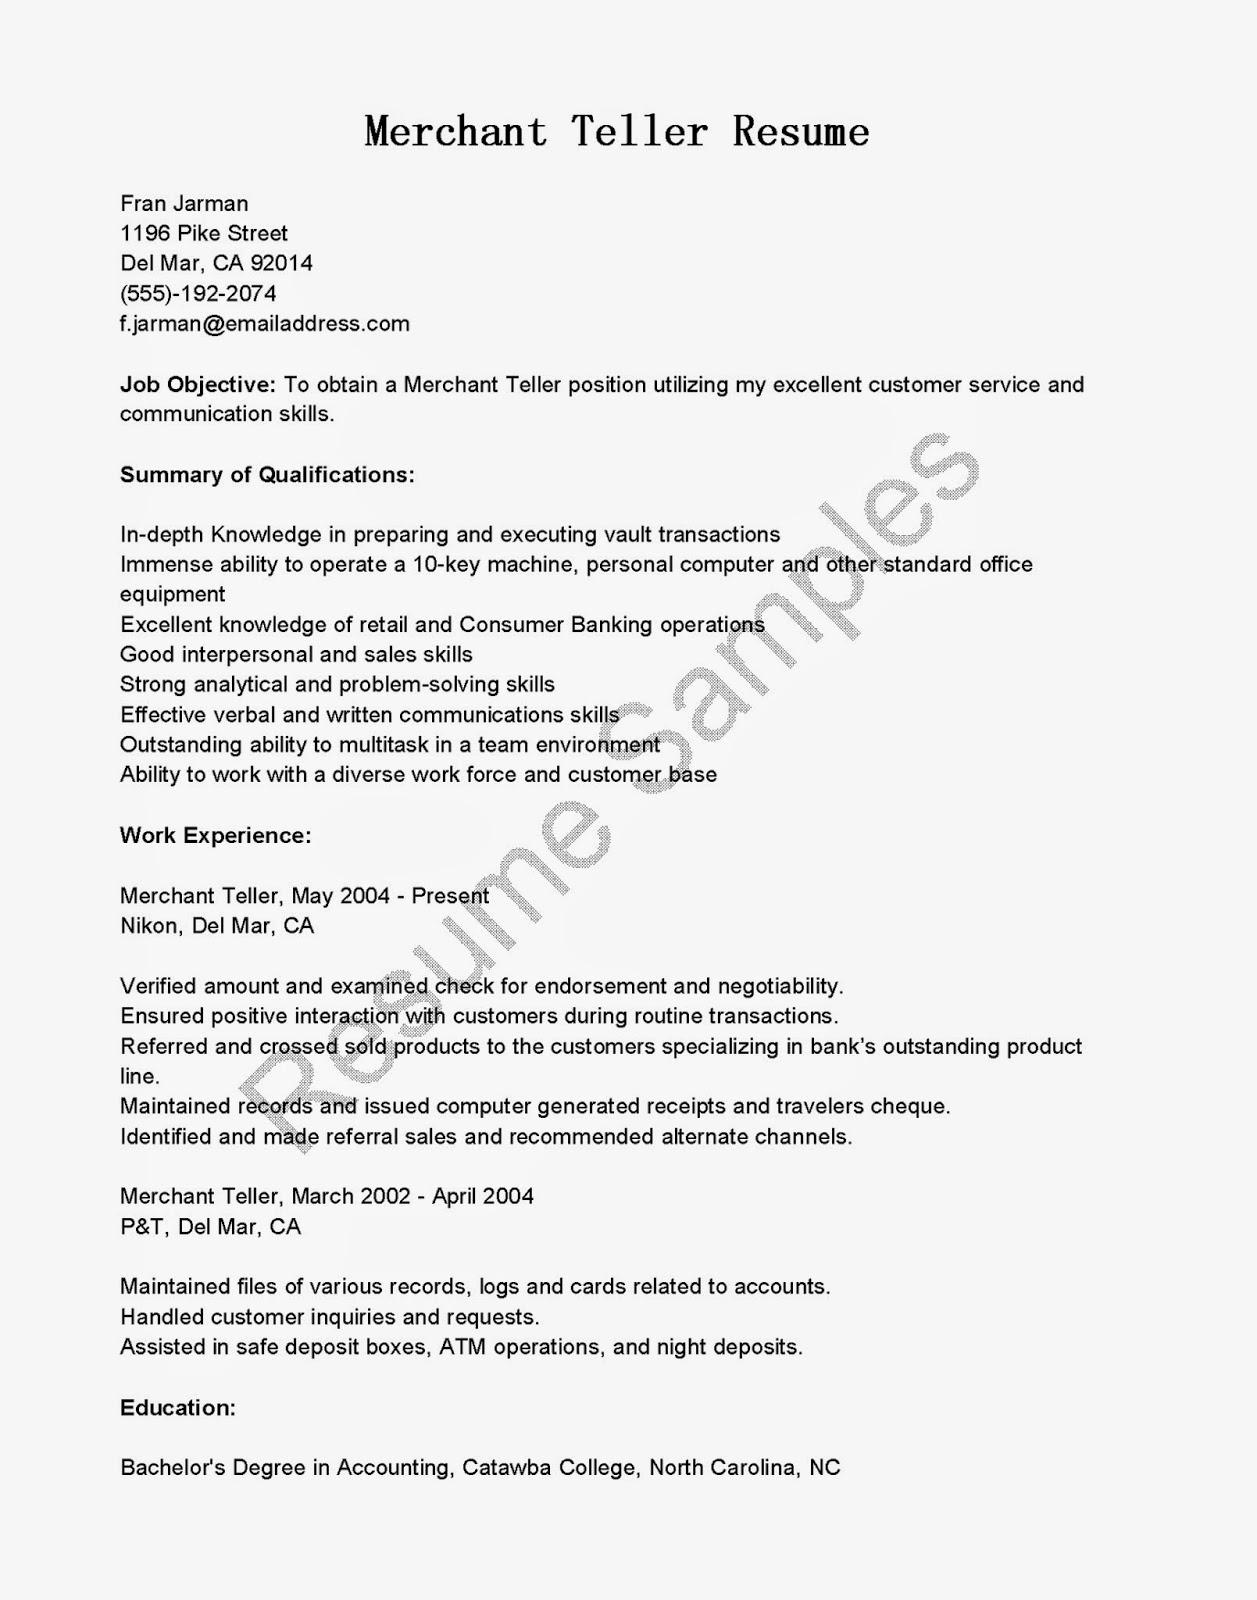 Resume Objective Bank Teller Regarding Bank Teller Resume Objective  Bank Teller Resume Skills